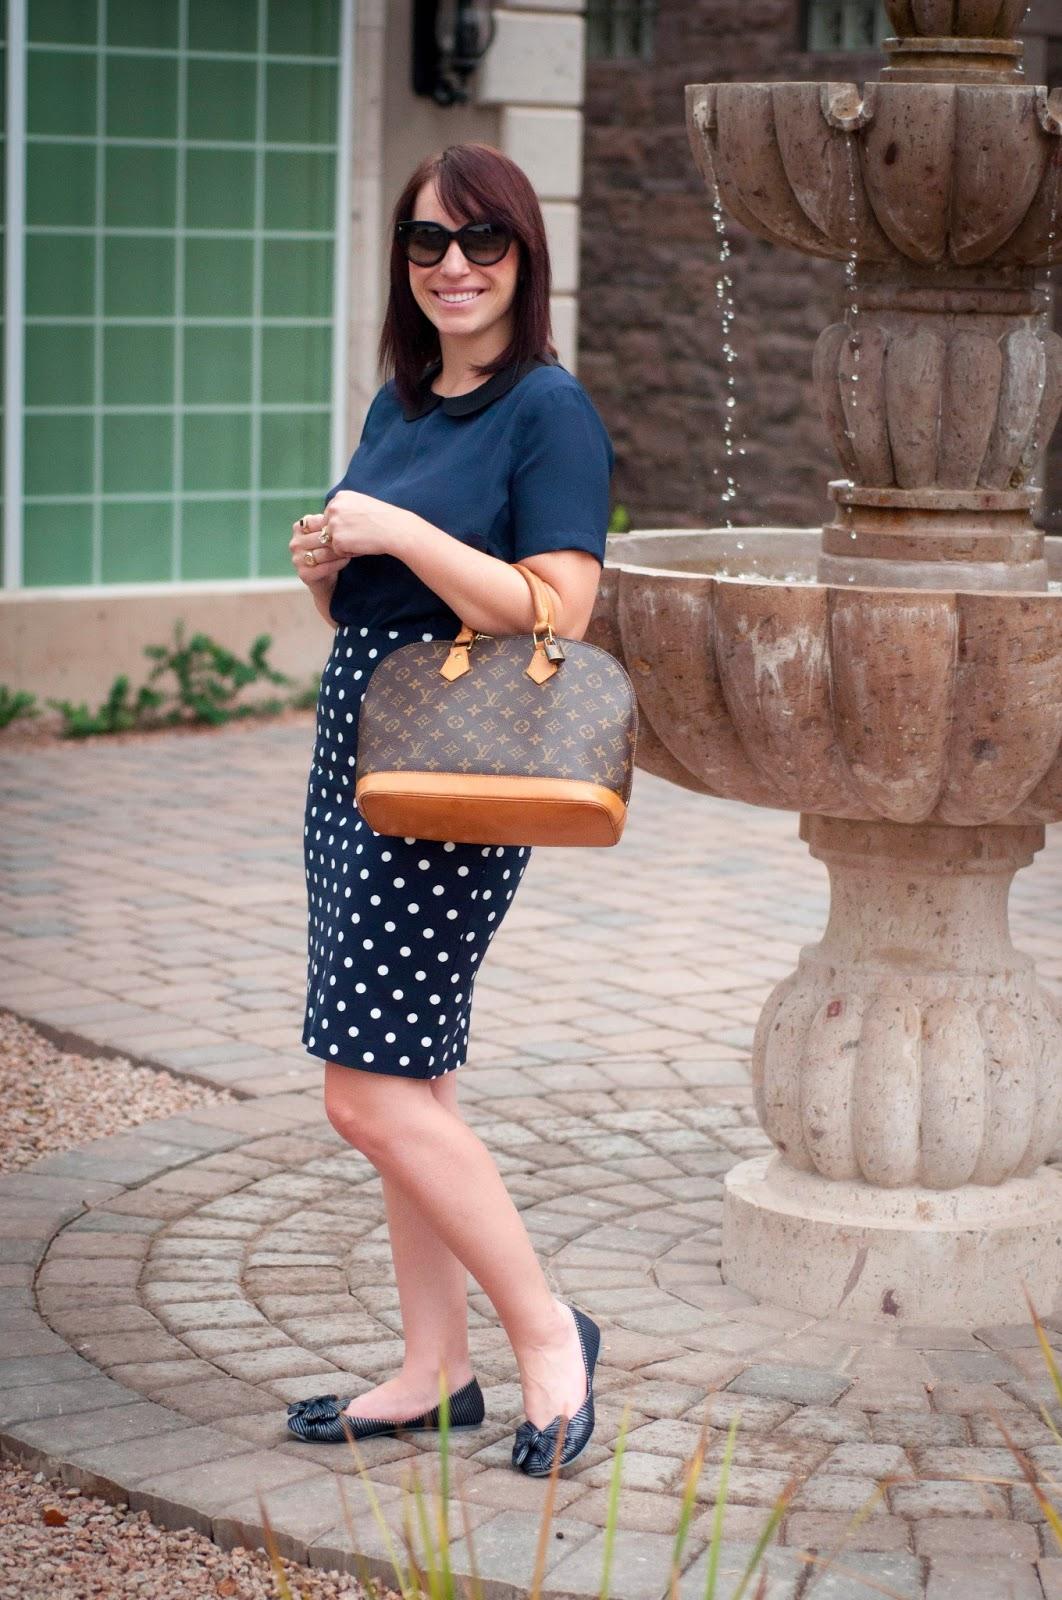 target style, prada sunglasses, blow flats, ootd, style blog, fashion blog, polka dot skirt, louis vuitton top handle bag